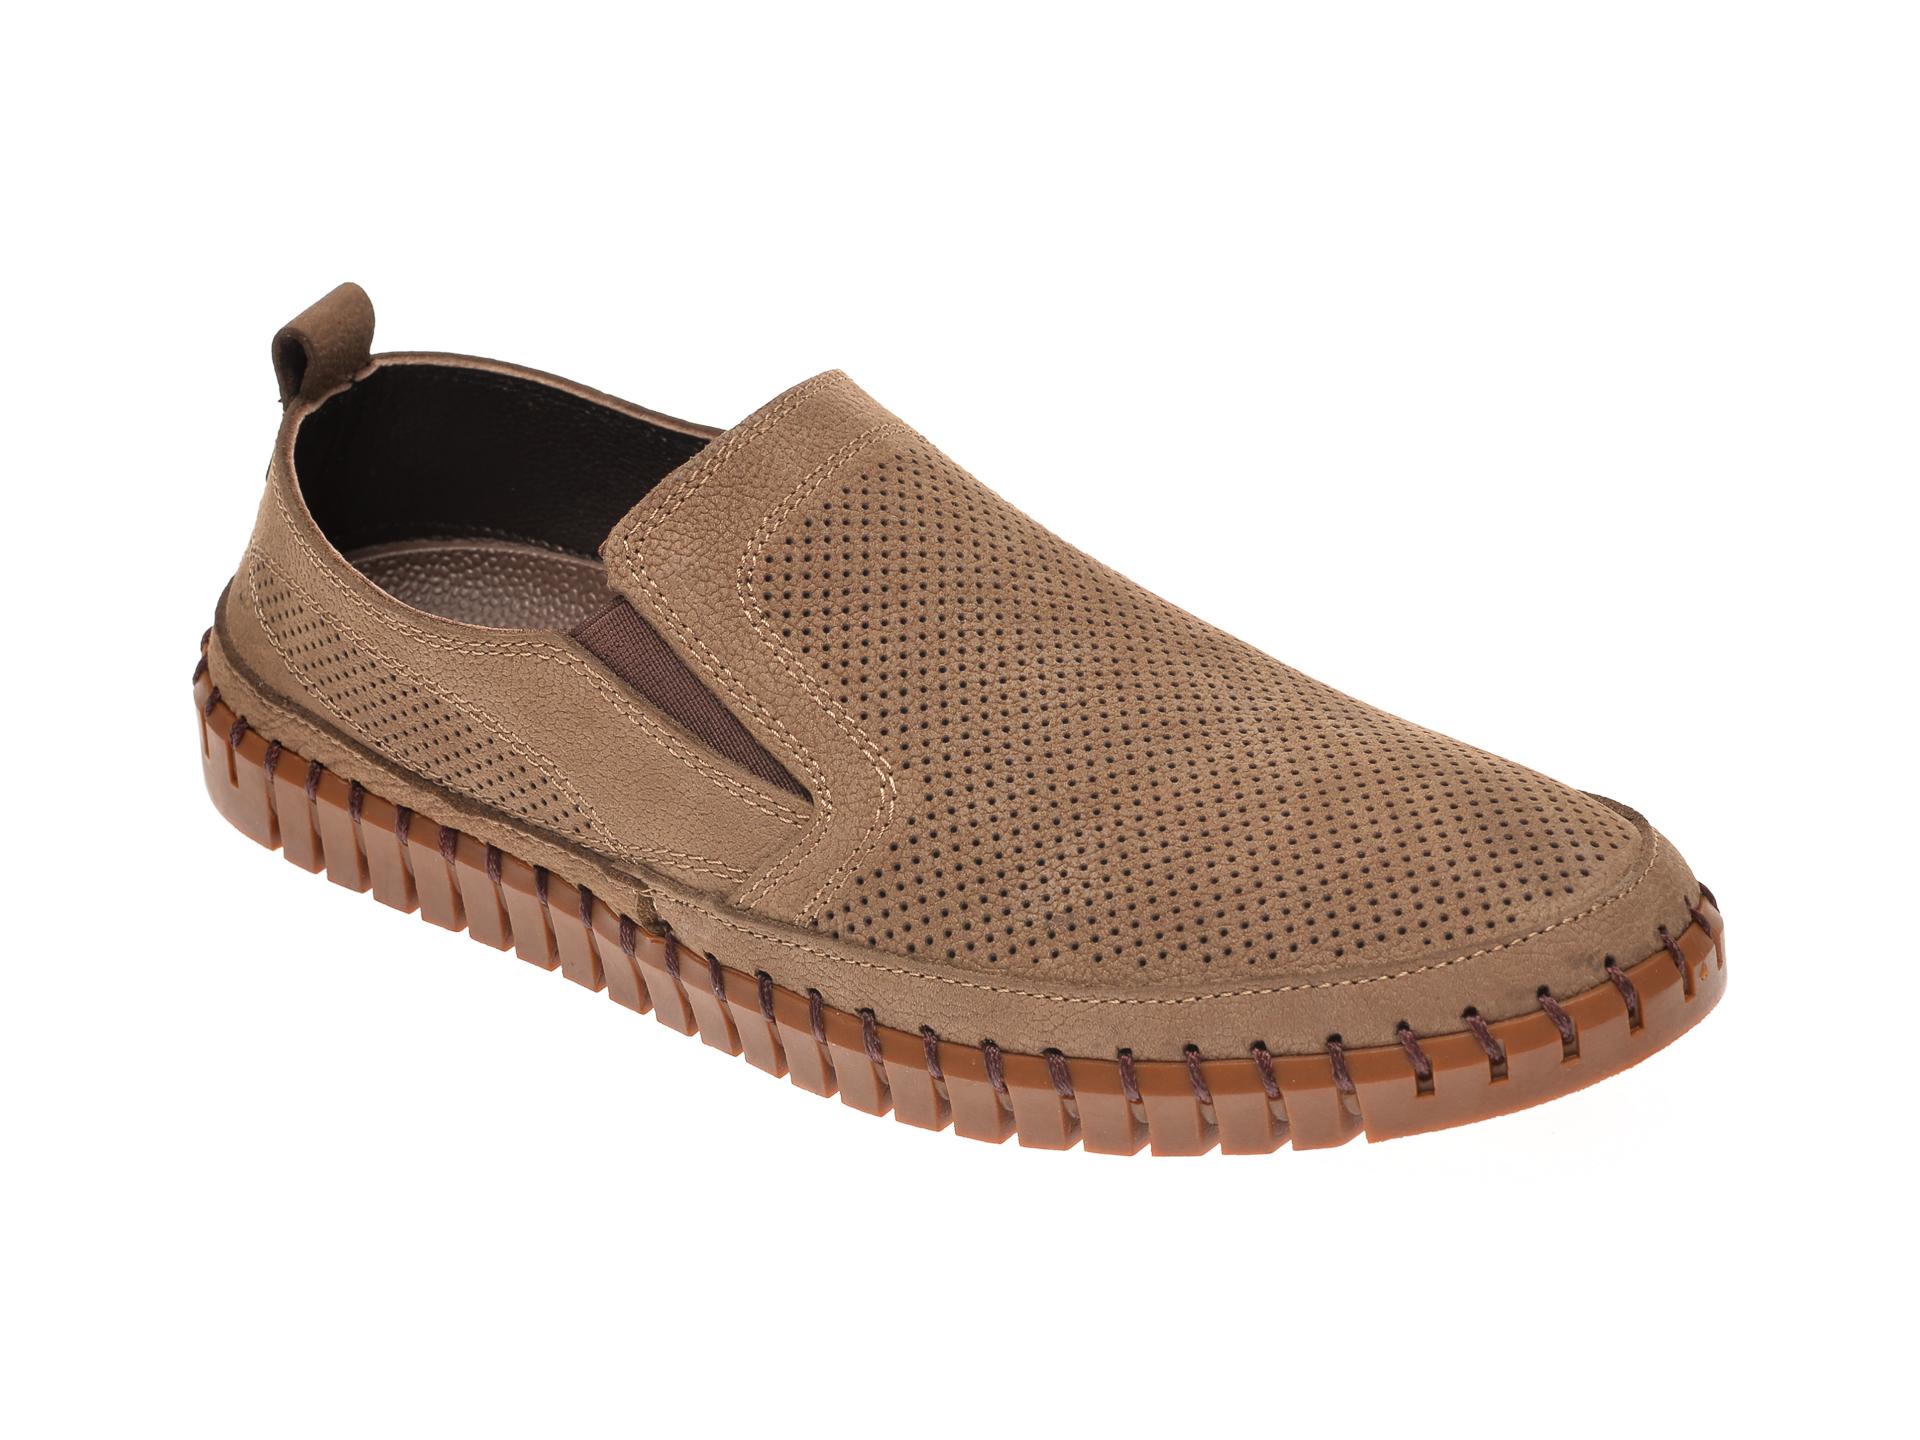 Pantofi MIASCARPA maro, P072612, din piele intoarsa imagine